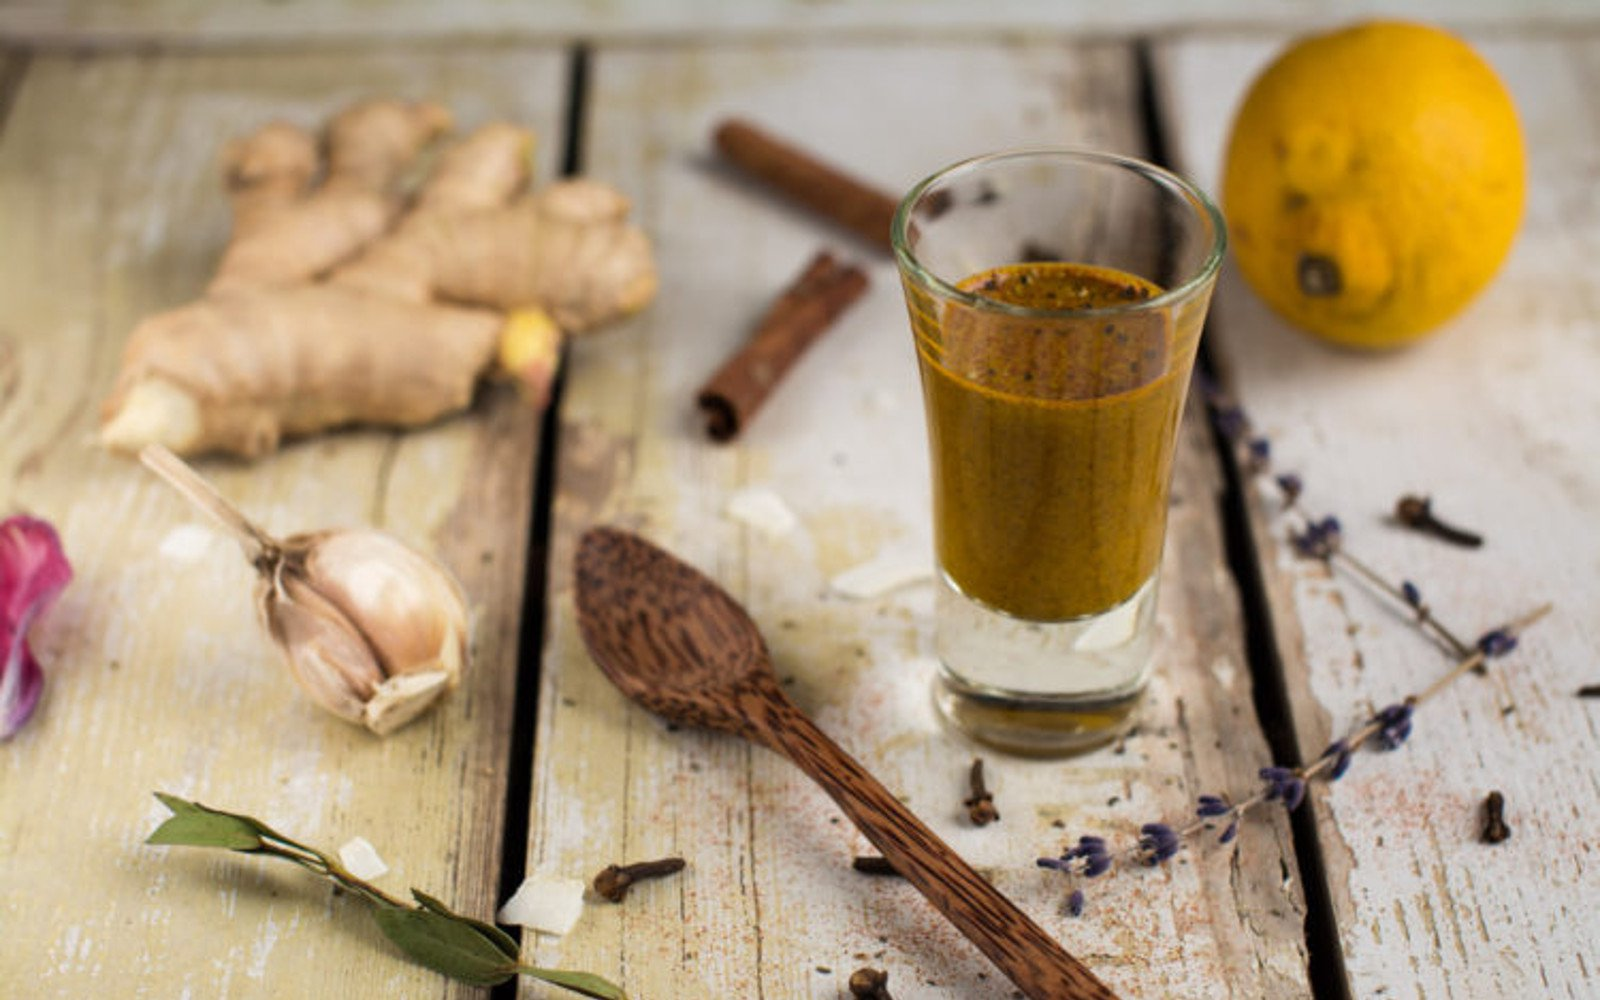 Anti-inflammatory cold remedy shot with turmeric